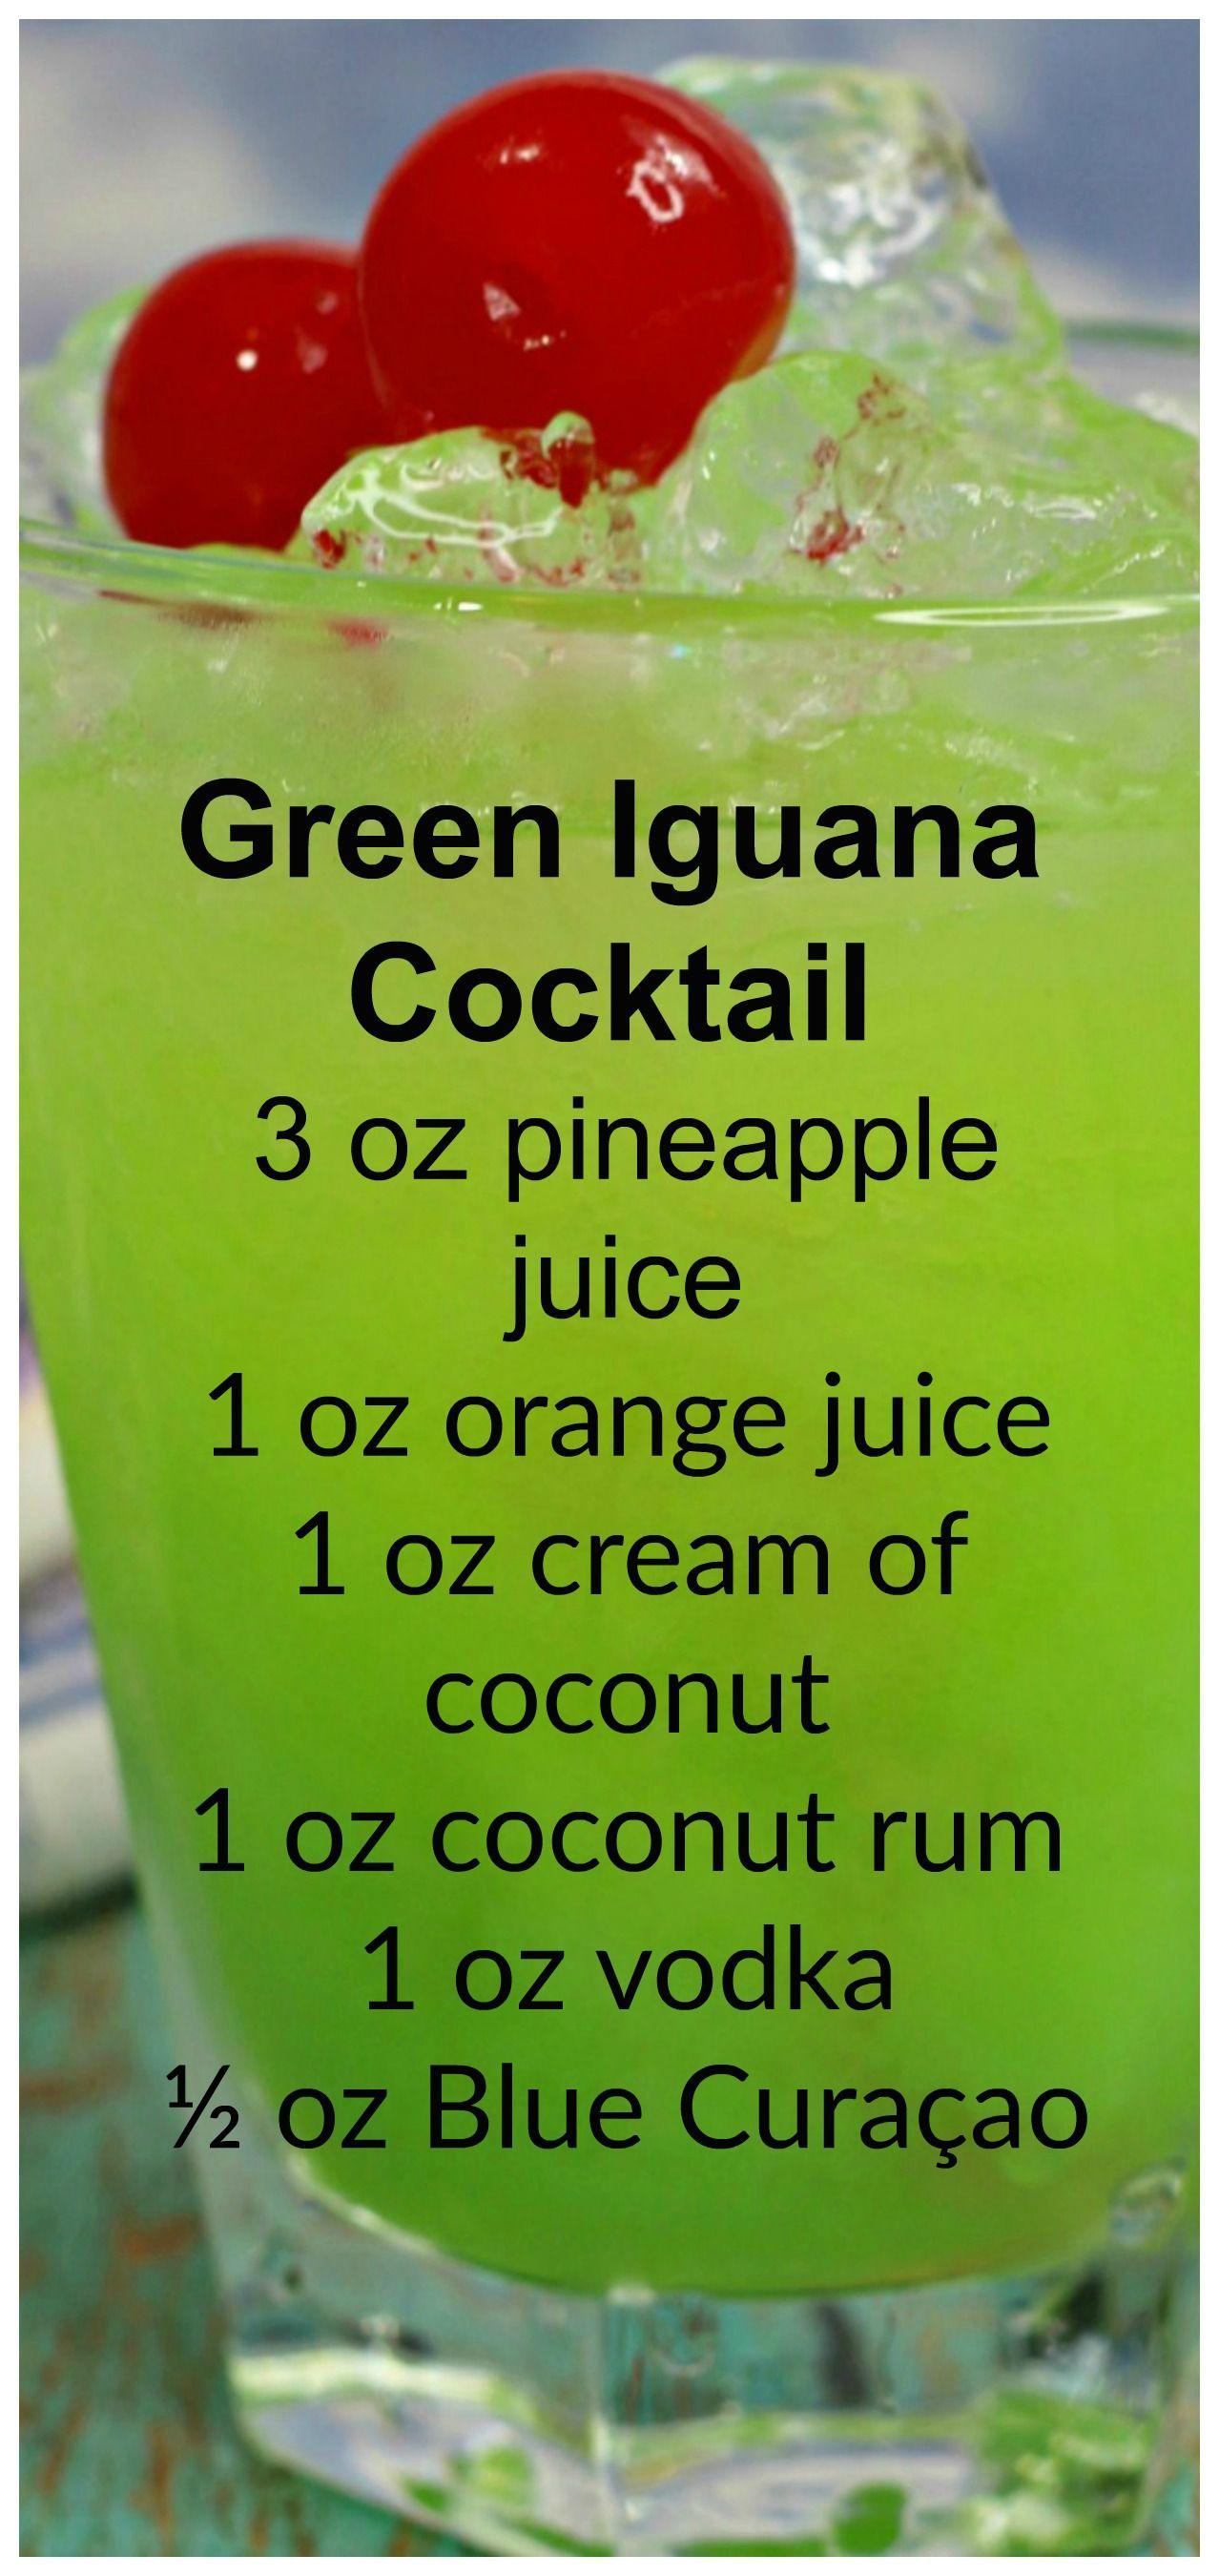 Green Iguana Cocktail